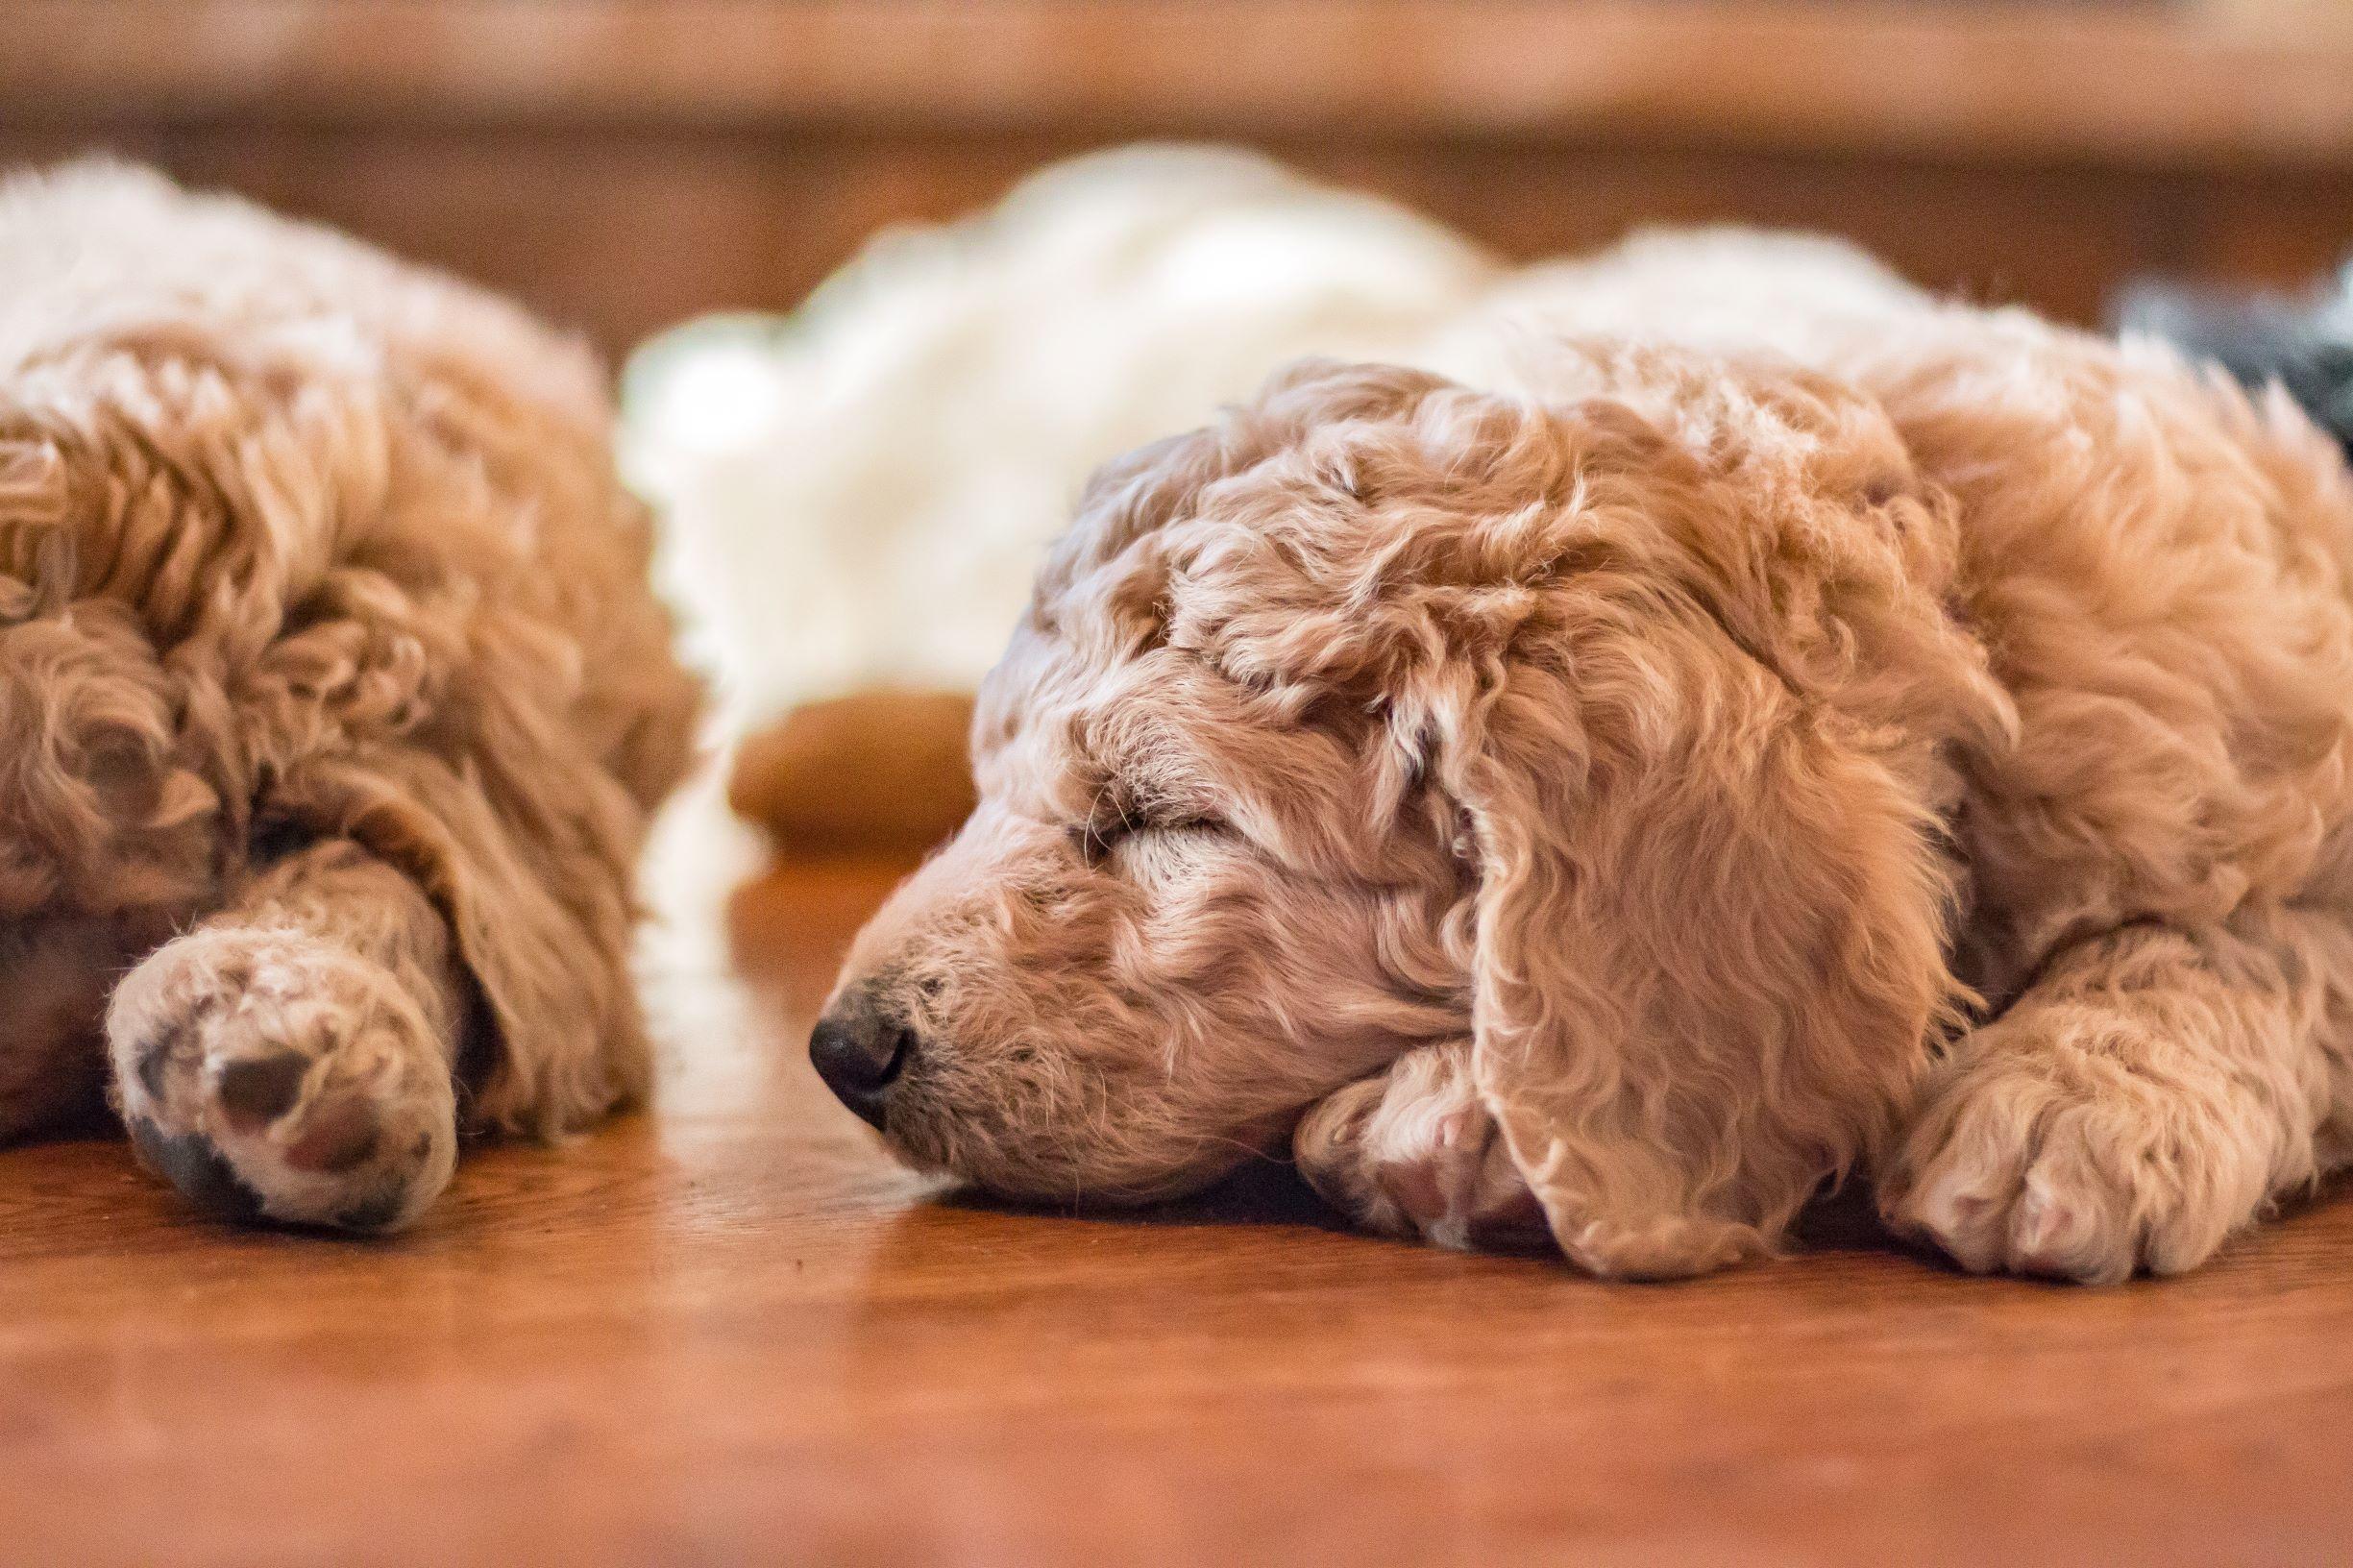 IMG_1624 Puppies.jpg